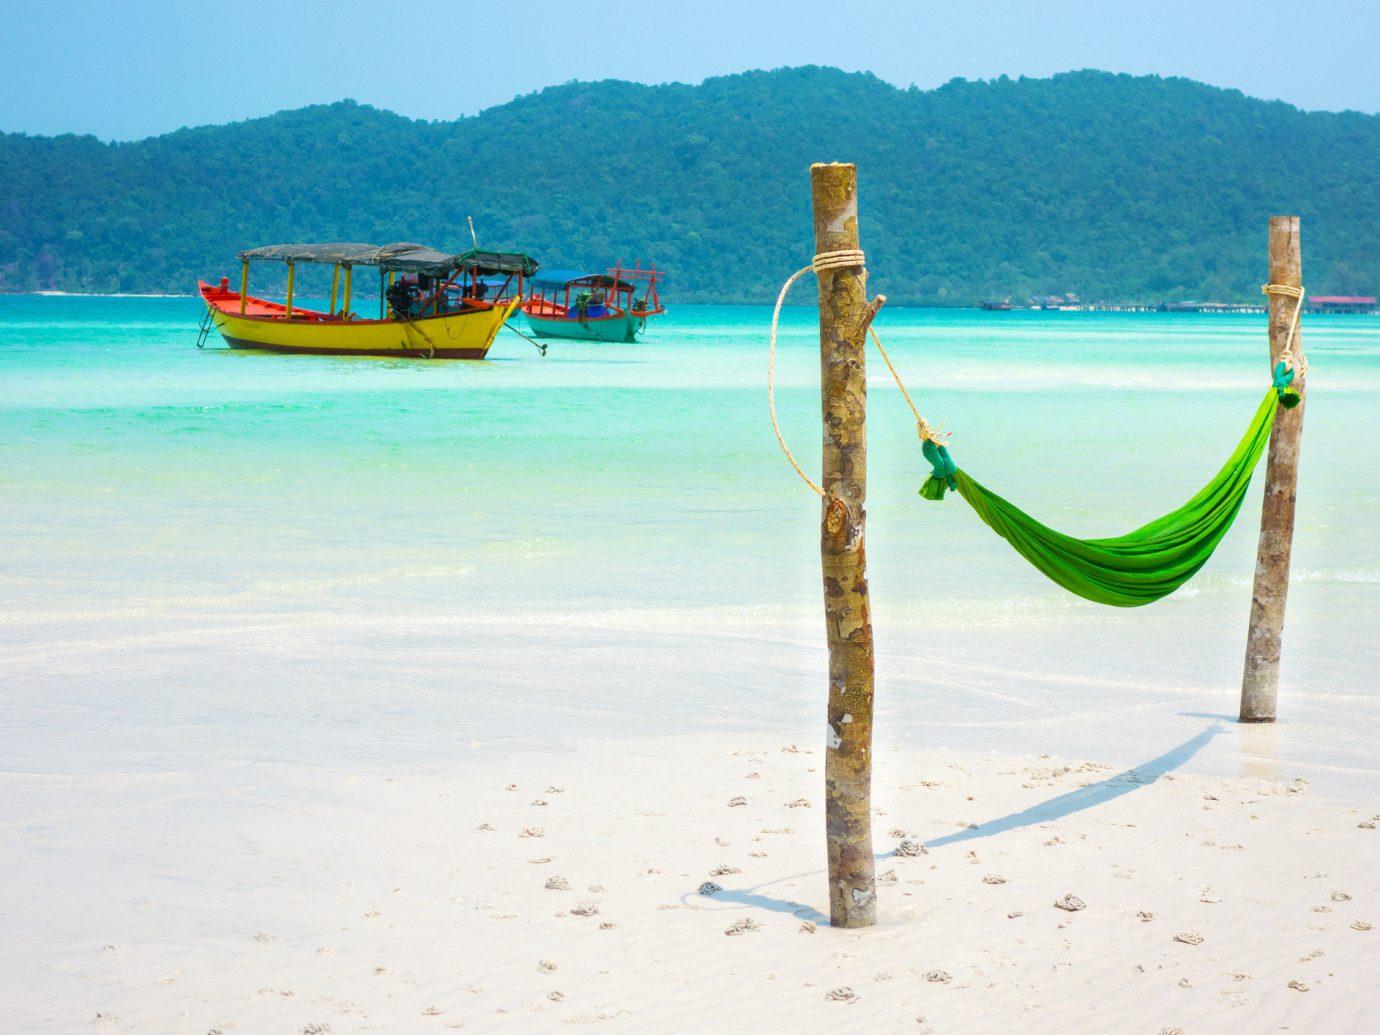 Trip Ideas sky water outdoor Sea coastal and oceanic landforms Beach vacation shore caribbean Ocean leisure tourism tropics Coast sand Playground